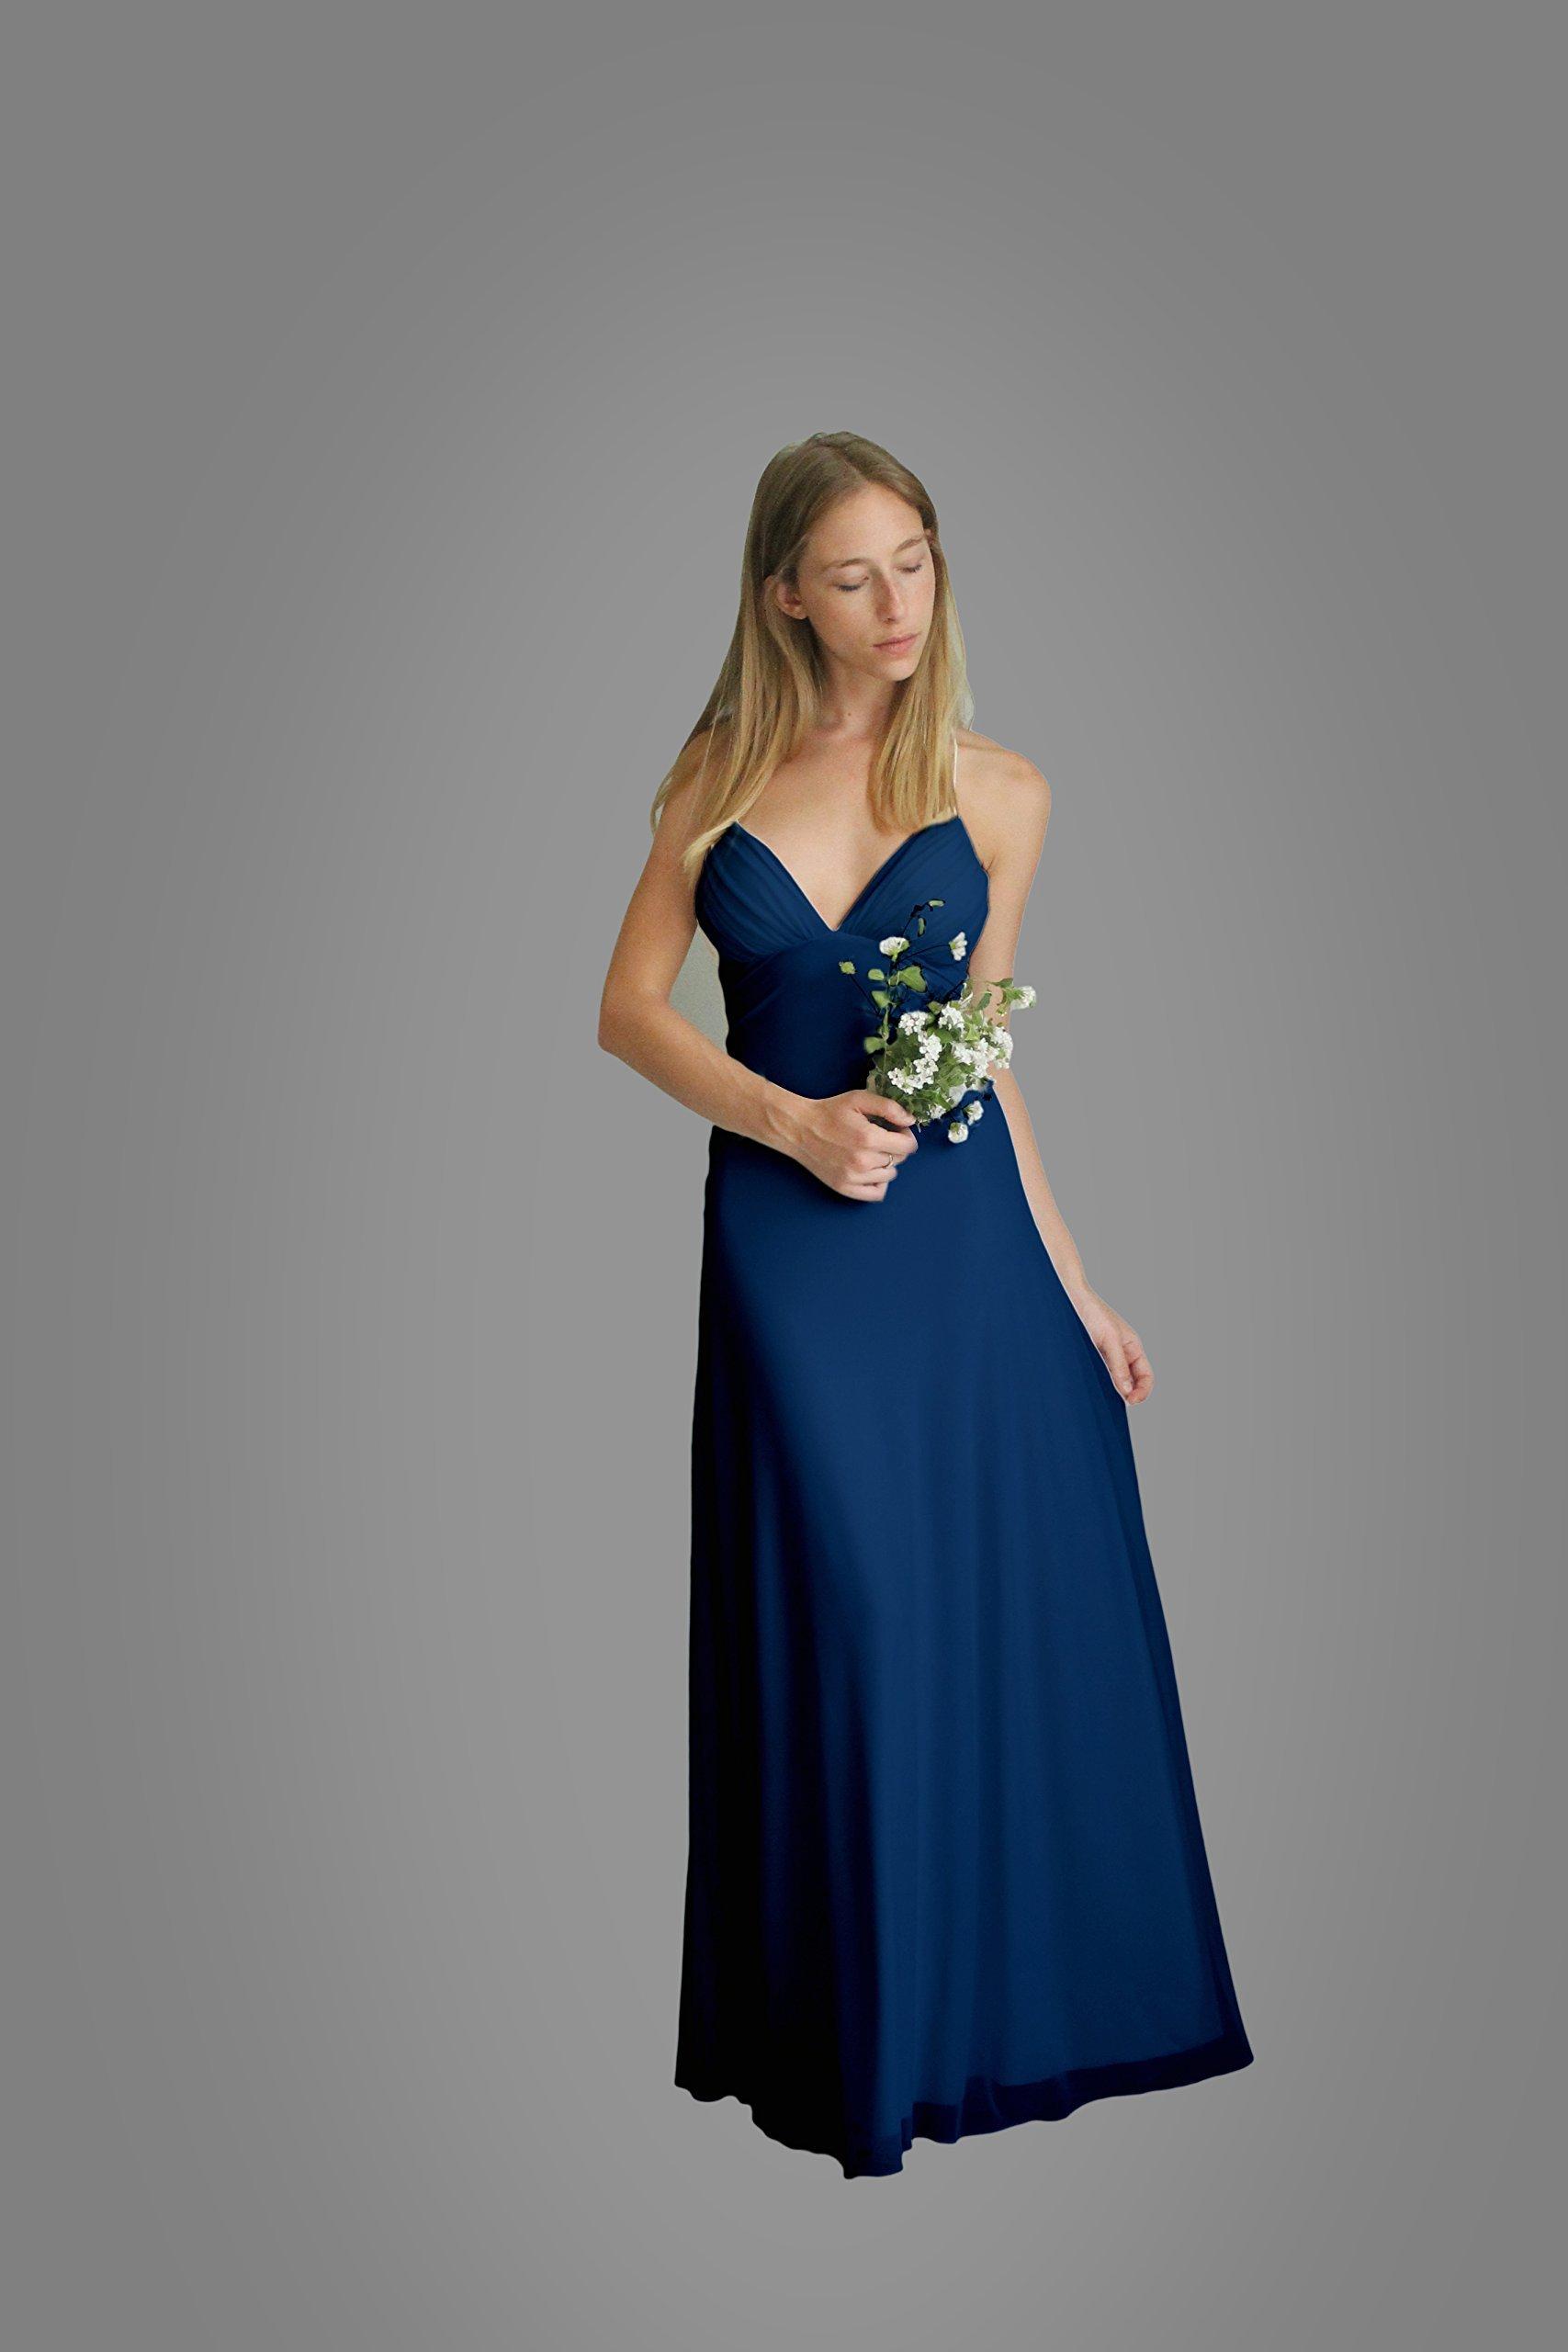 Women's Dress, Navy Blue Bridesmaid Evening Dress, Size M, Maxi Long Dress for Wedding, Chiffon Lycra Classic Gown